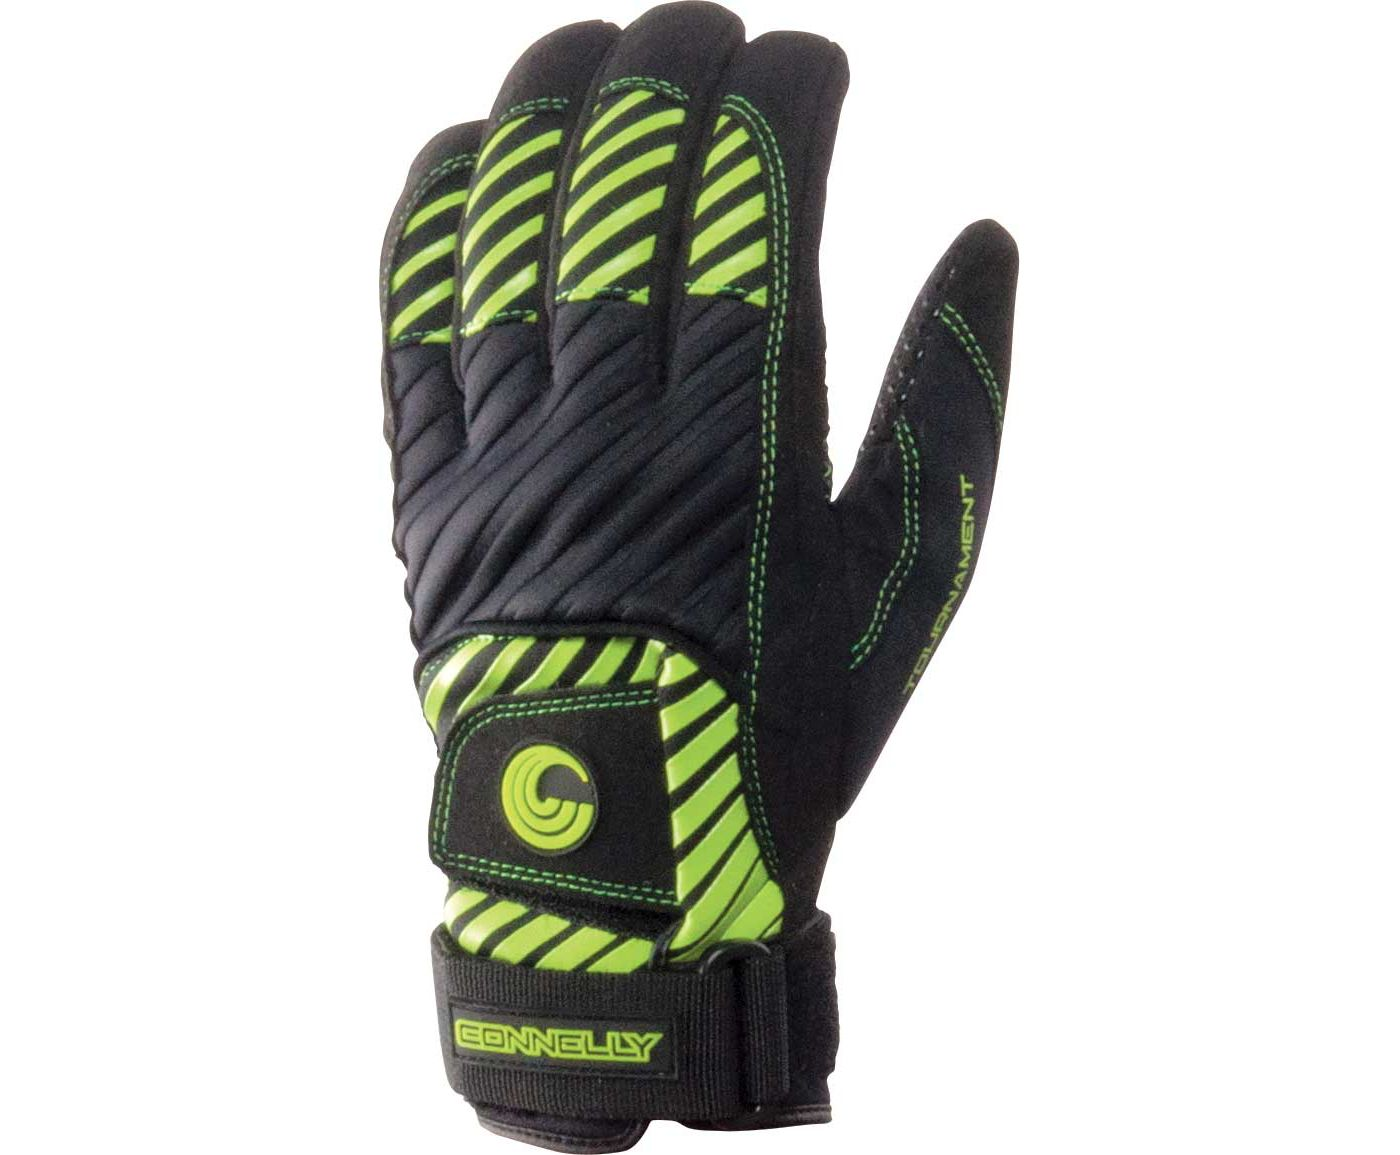 Connelly Men's Tournament Water Ski Gloves